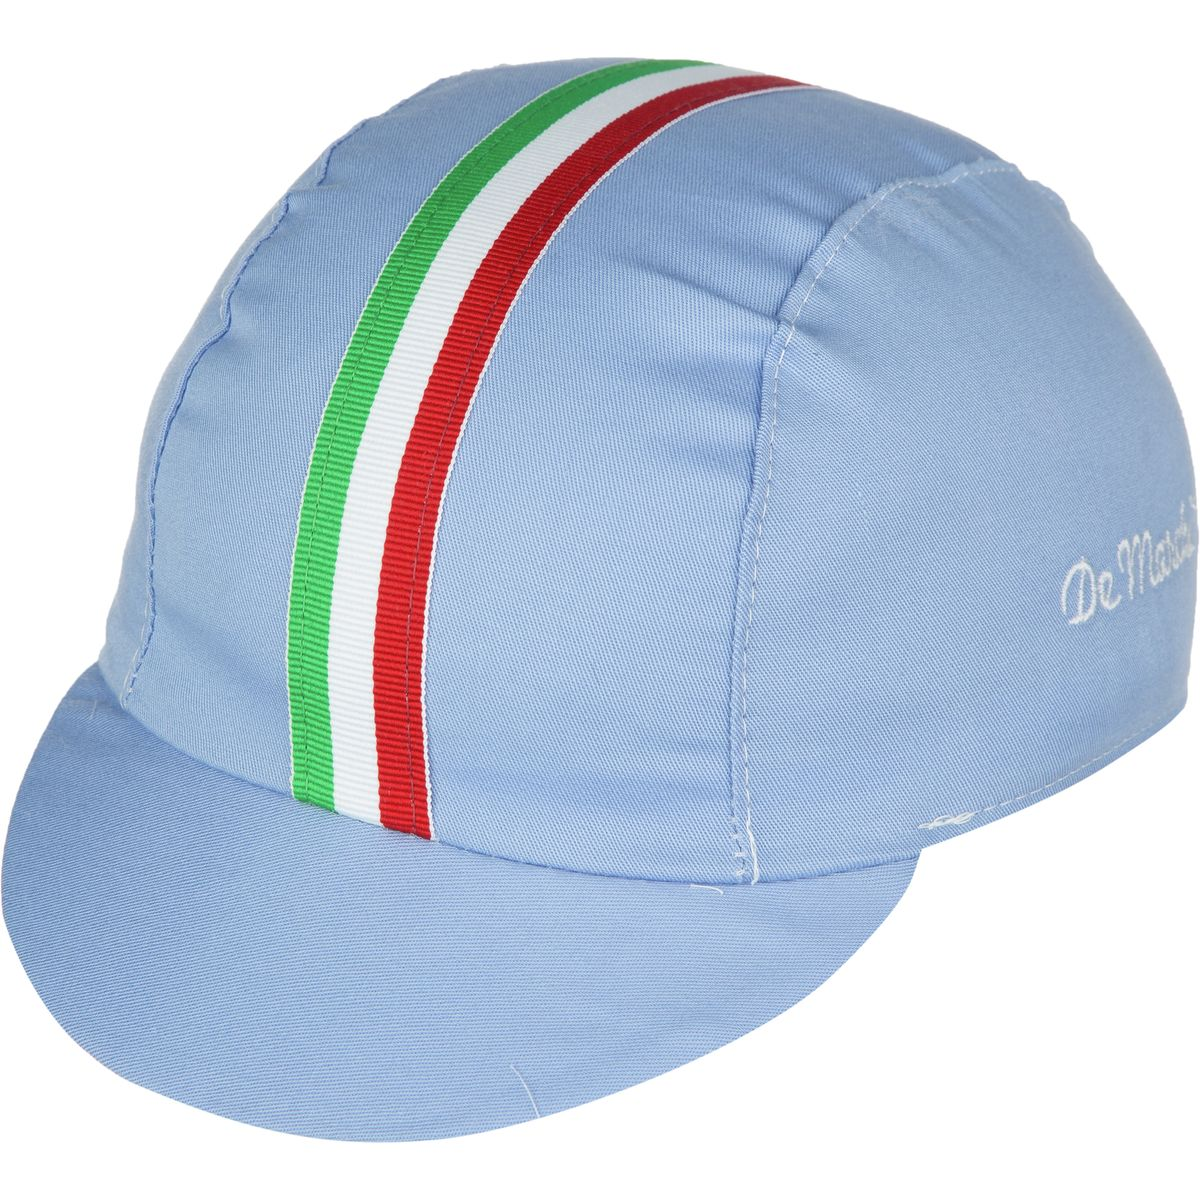 CAPPELLINI CICLISMO DE MARCHI PRO CAP - Cappellini vintage ... d7c495ab9947